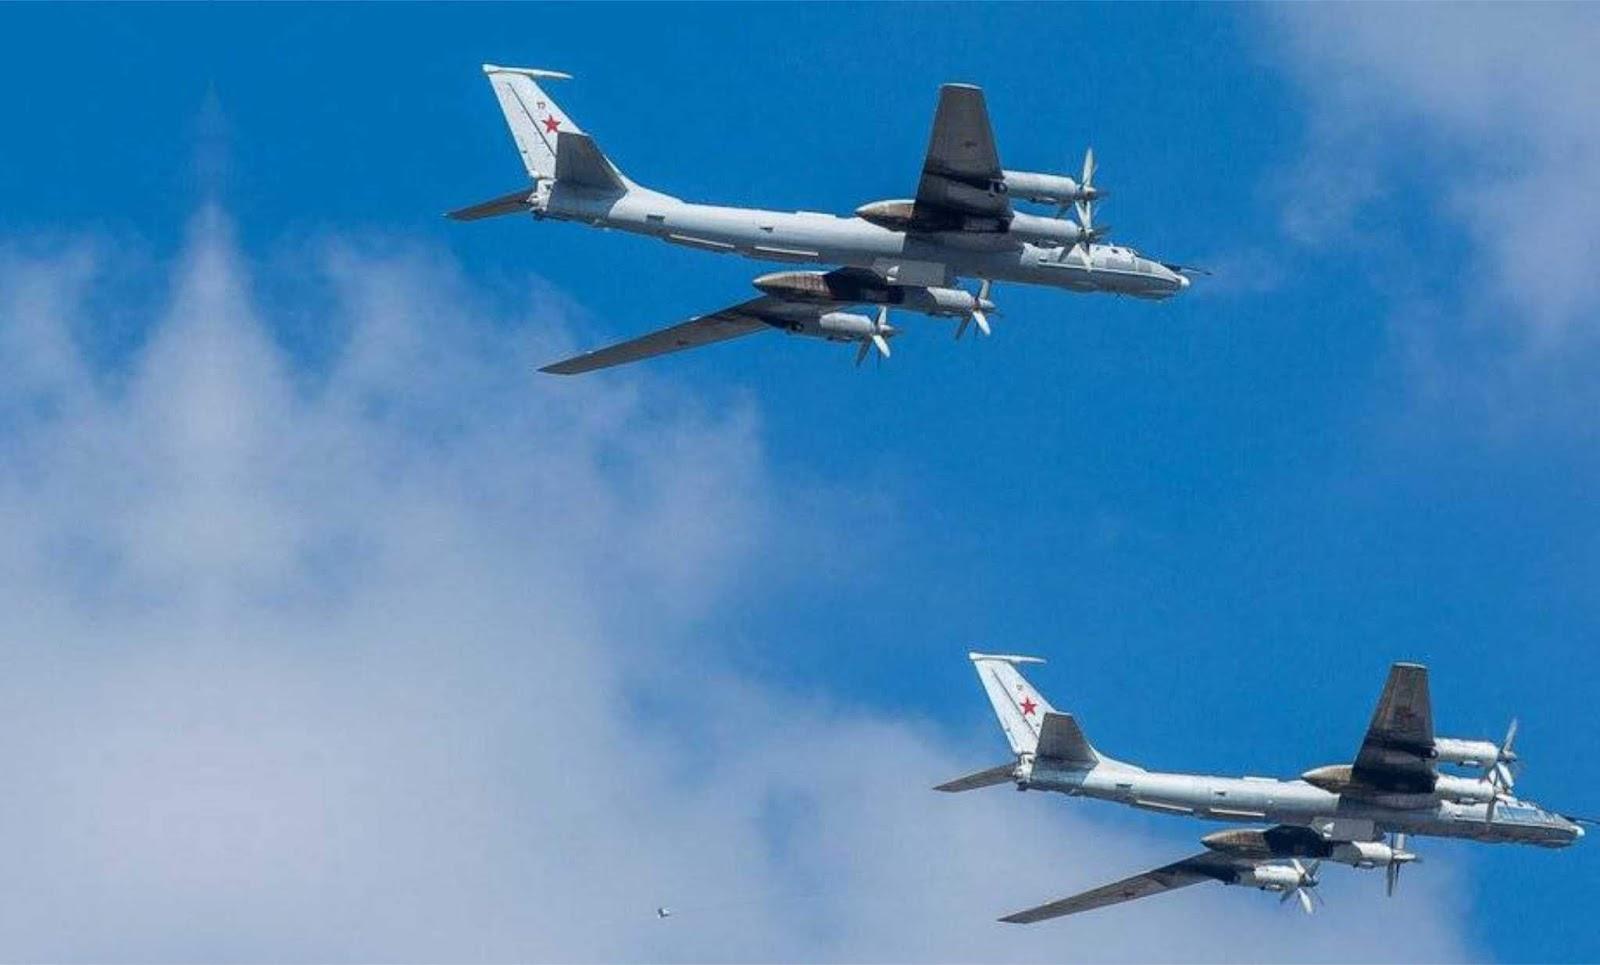 Sepasang Tu-142 Rusia dikawal dua pesawat tempur Typhoon Eurofighter AU Italia